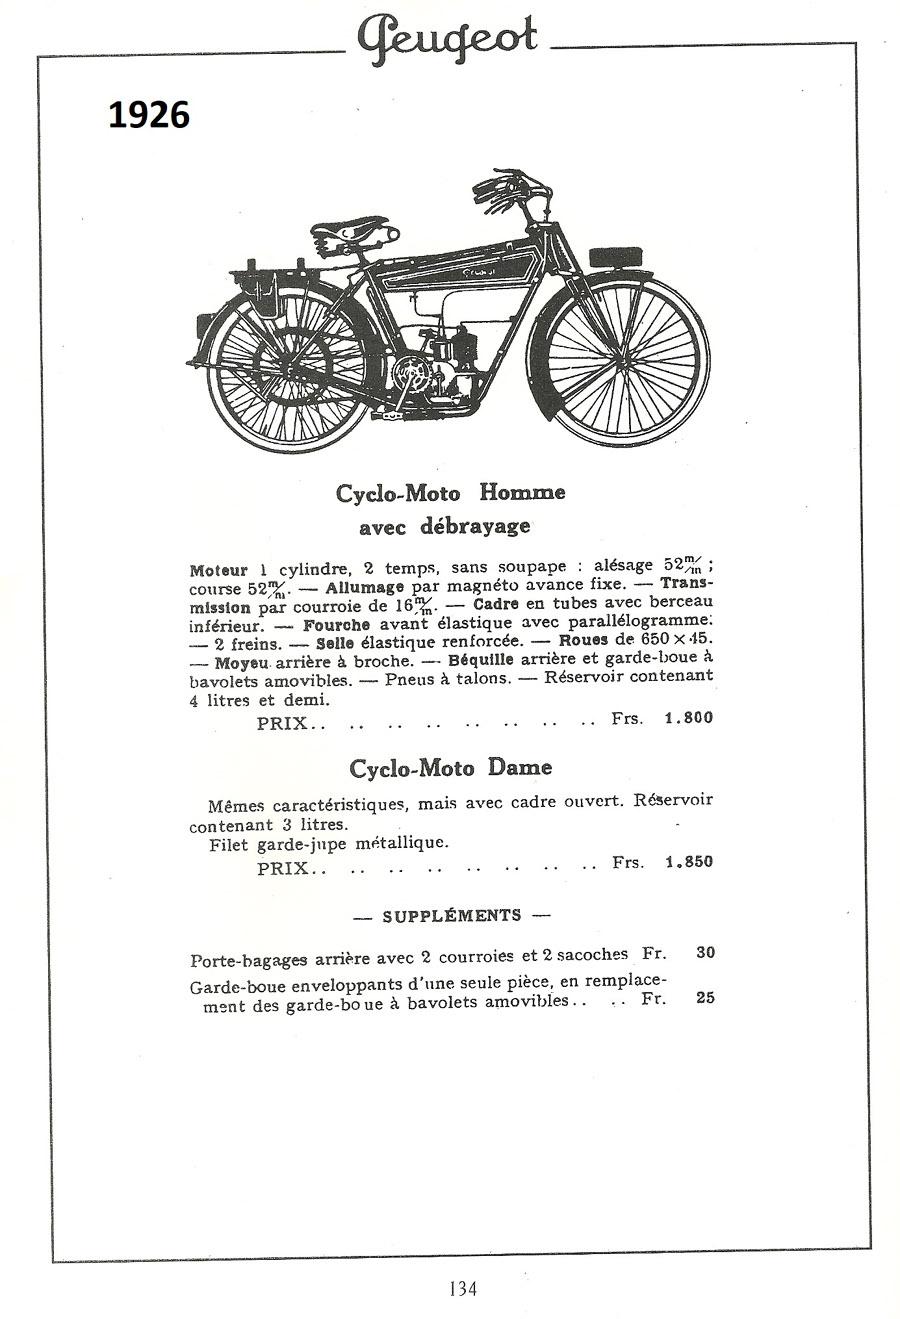 La Peugeot Cyclomoto de dom54 Numzor21